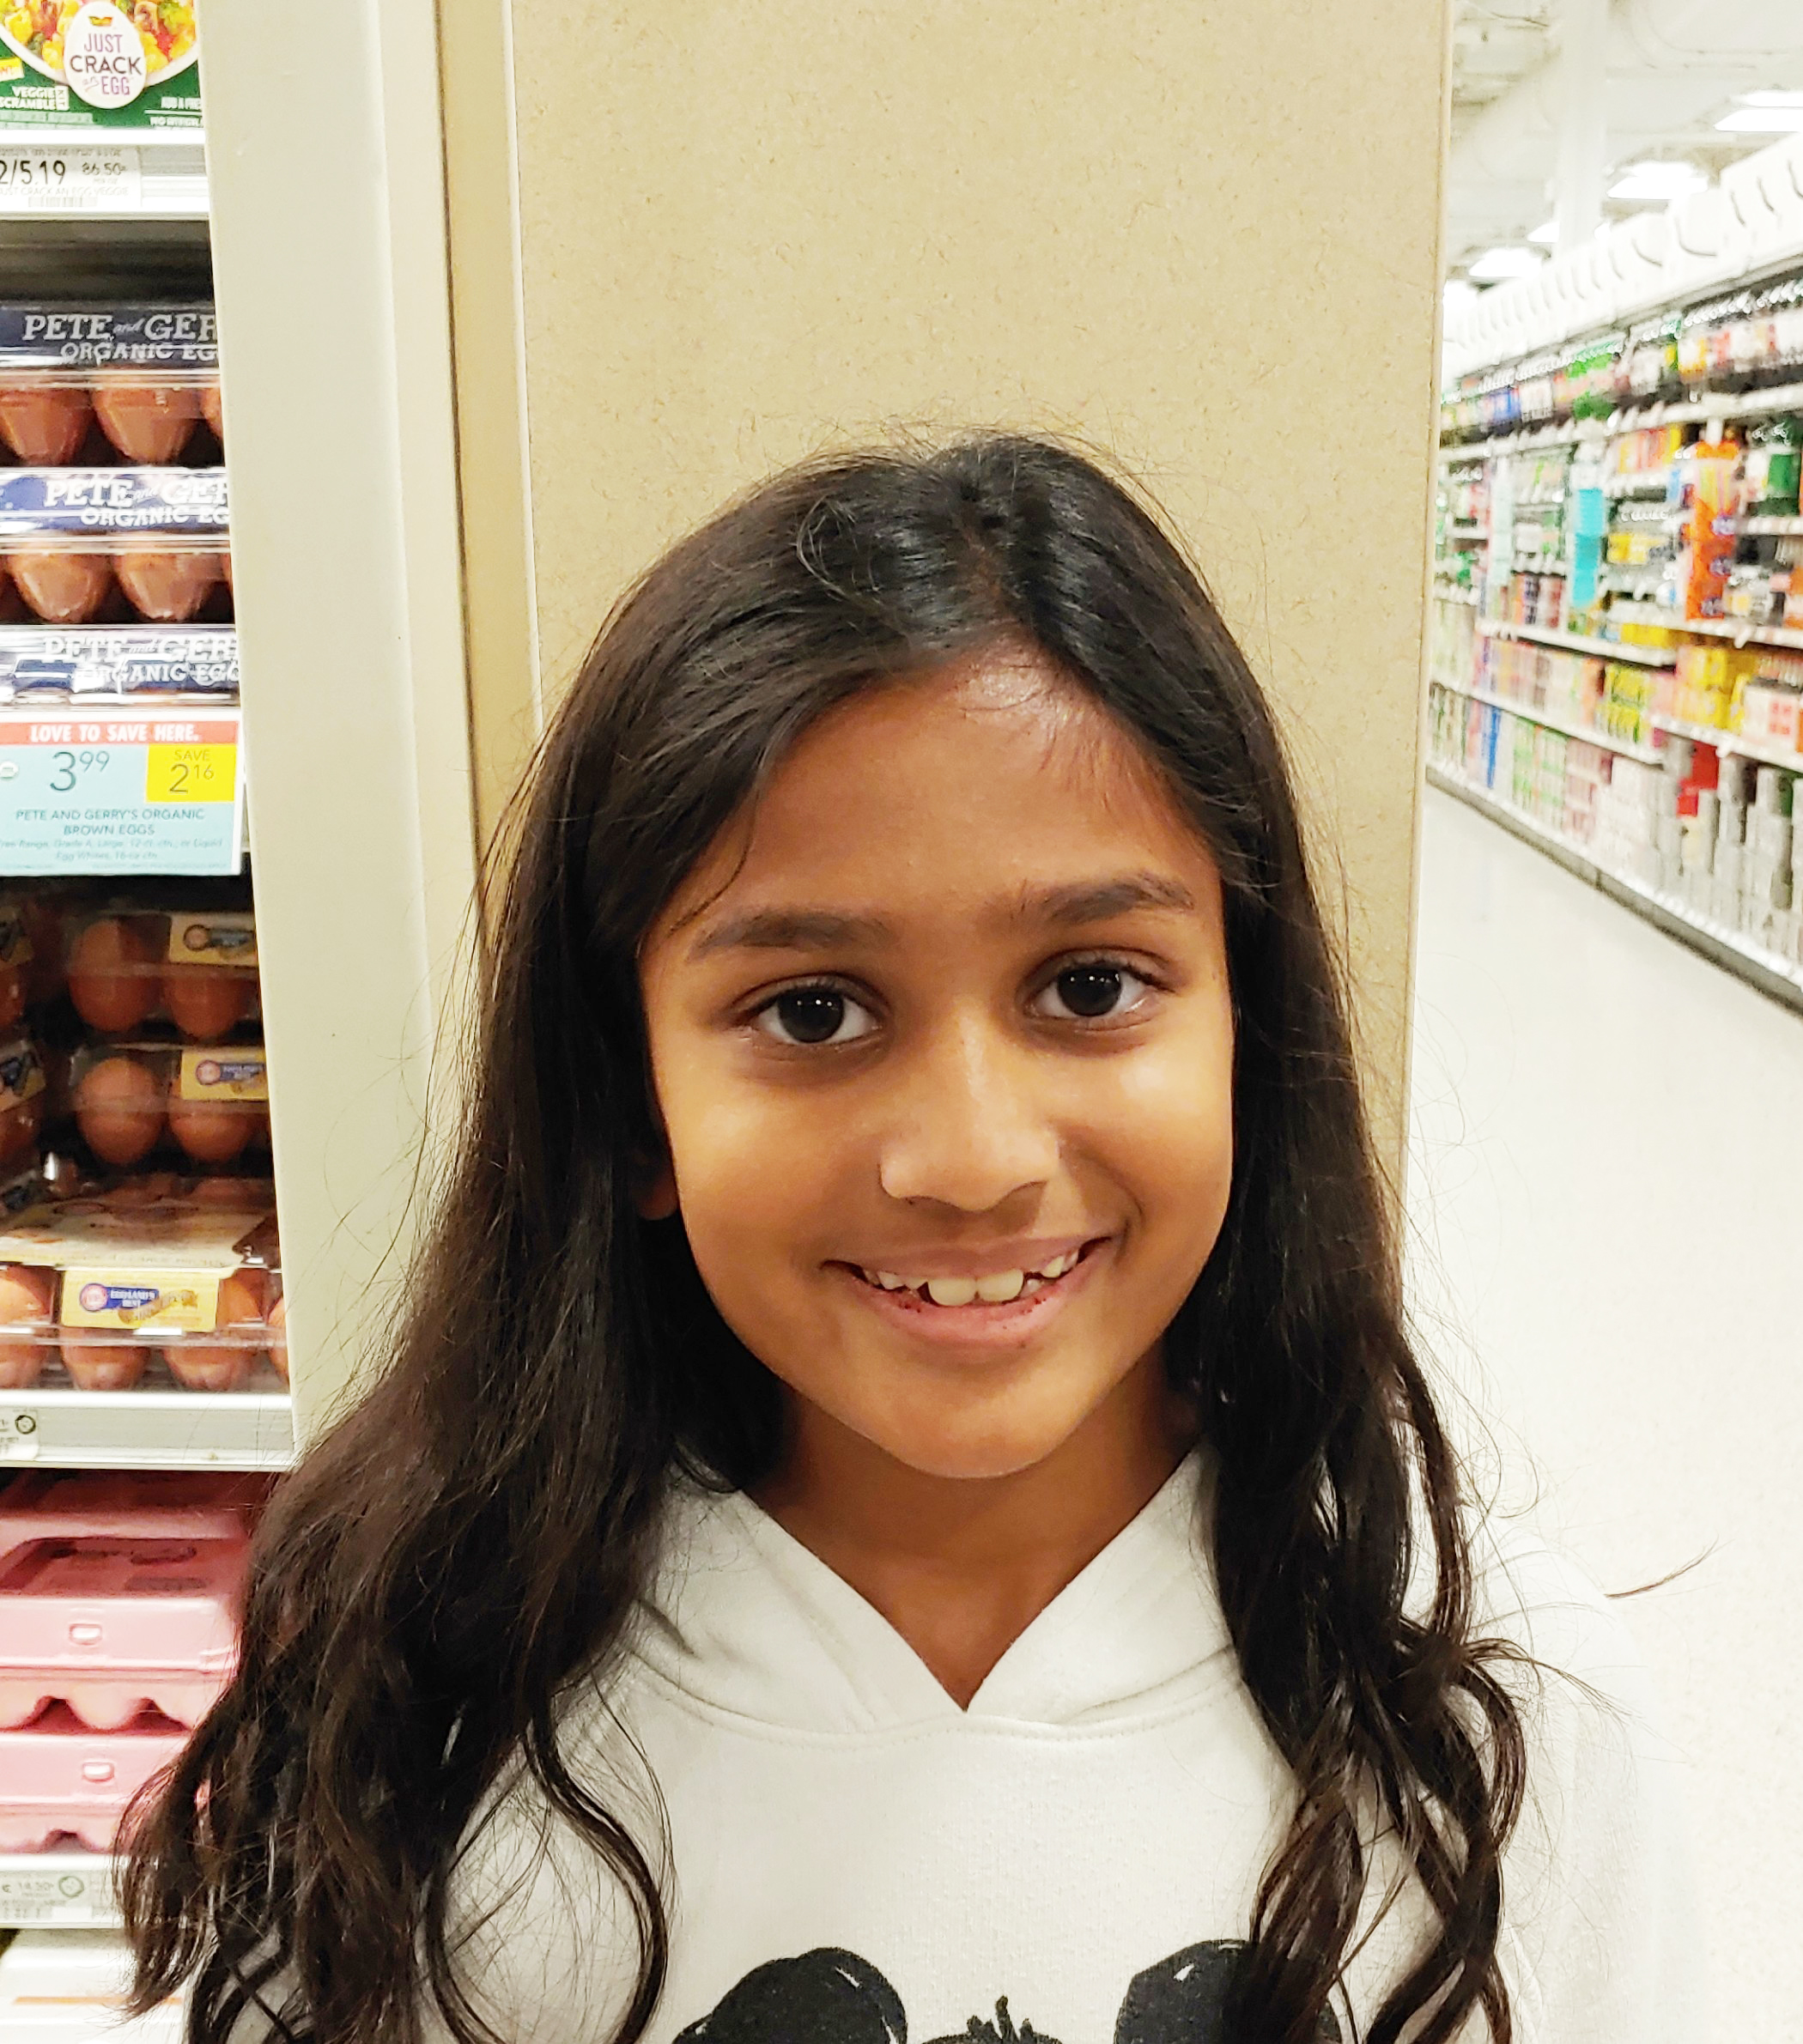 We eat turkey and play card games.  Maya, Age 9  Daniel Island